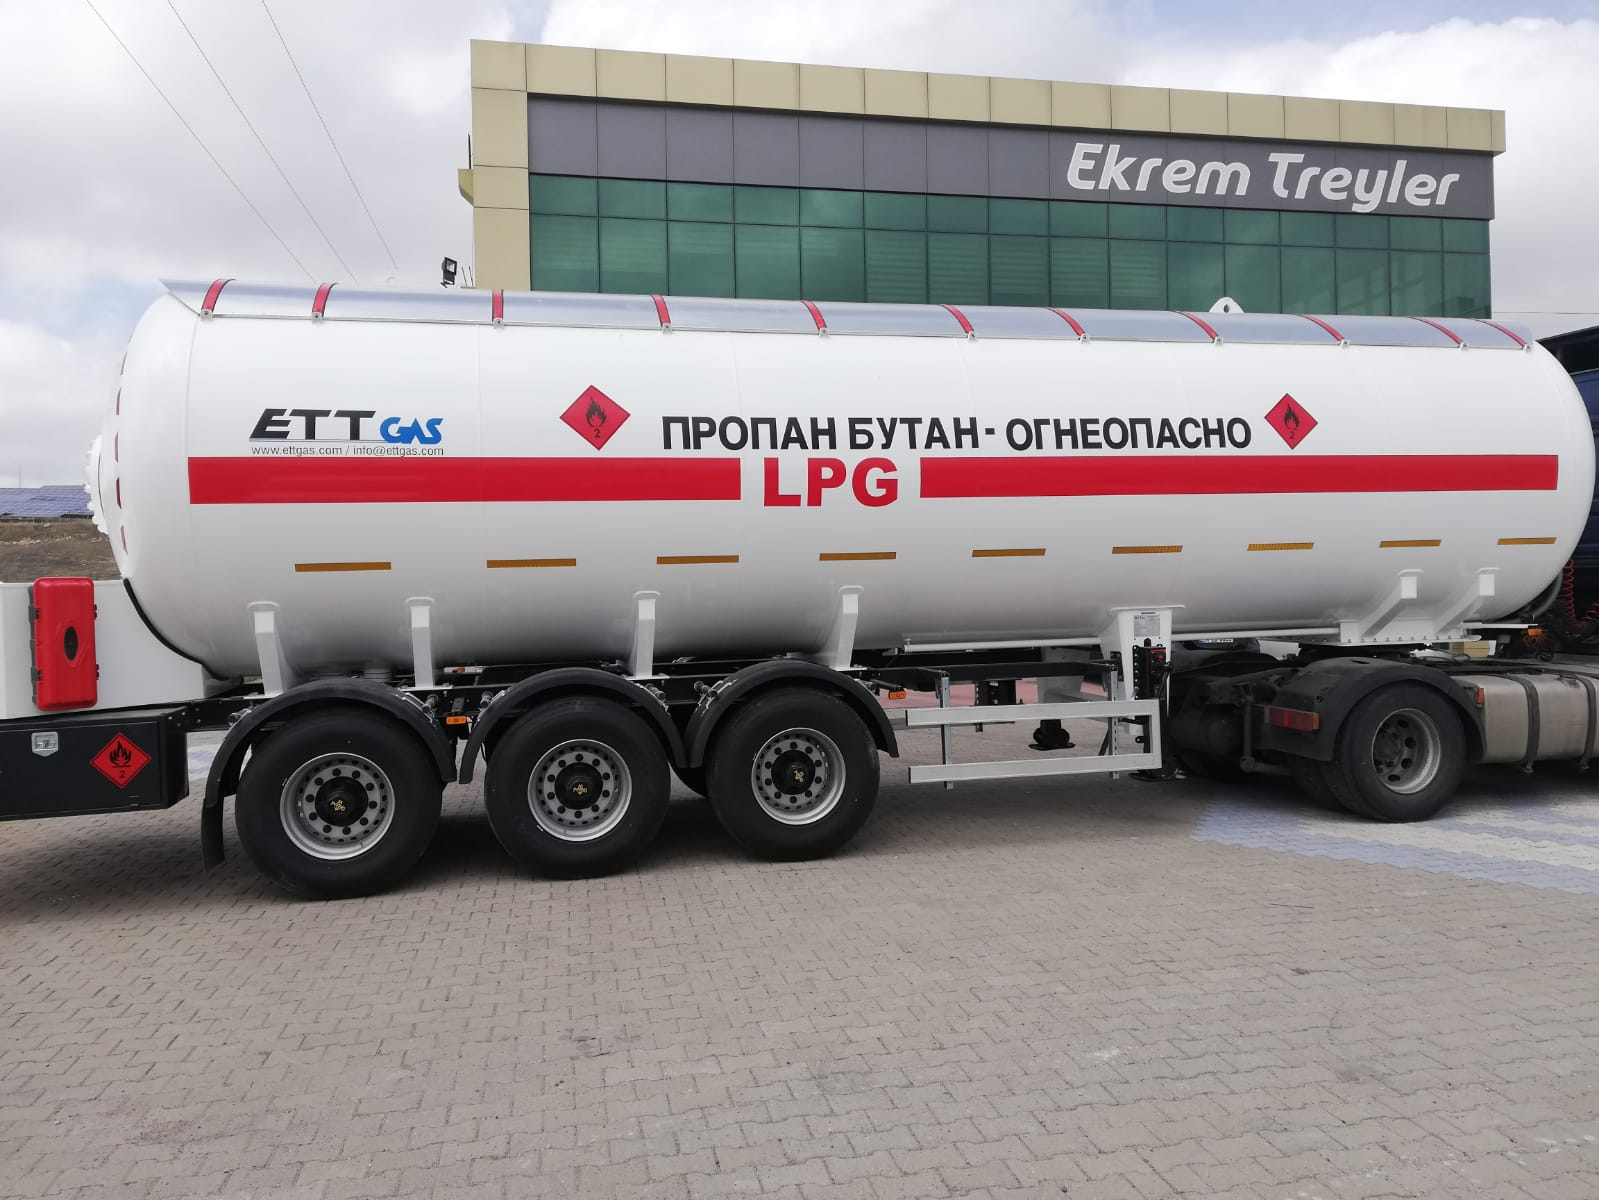 45 m3 LPG TRAILER WE SENT RUSSIA FEDERATION